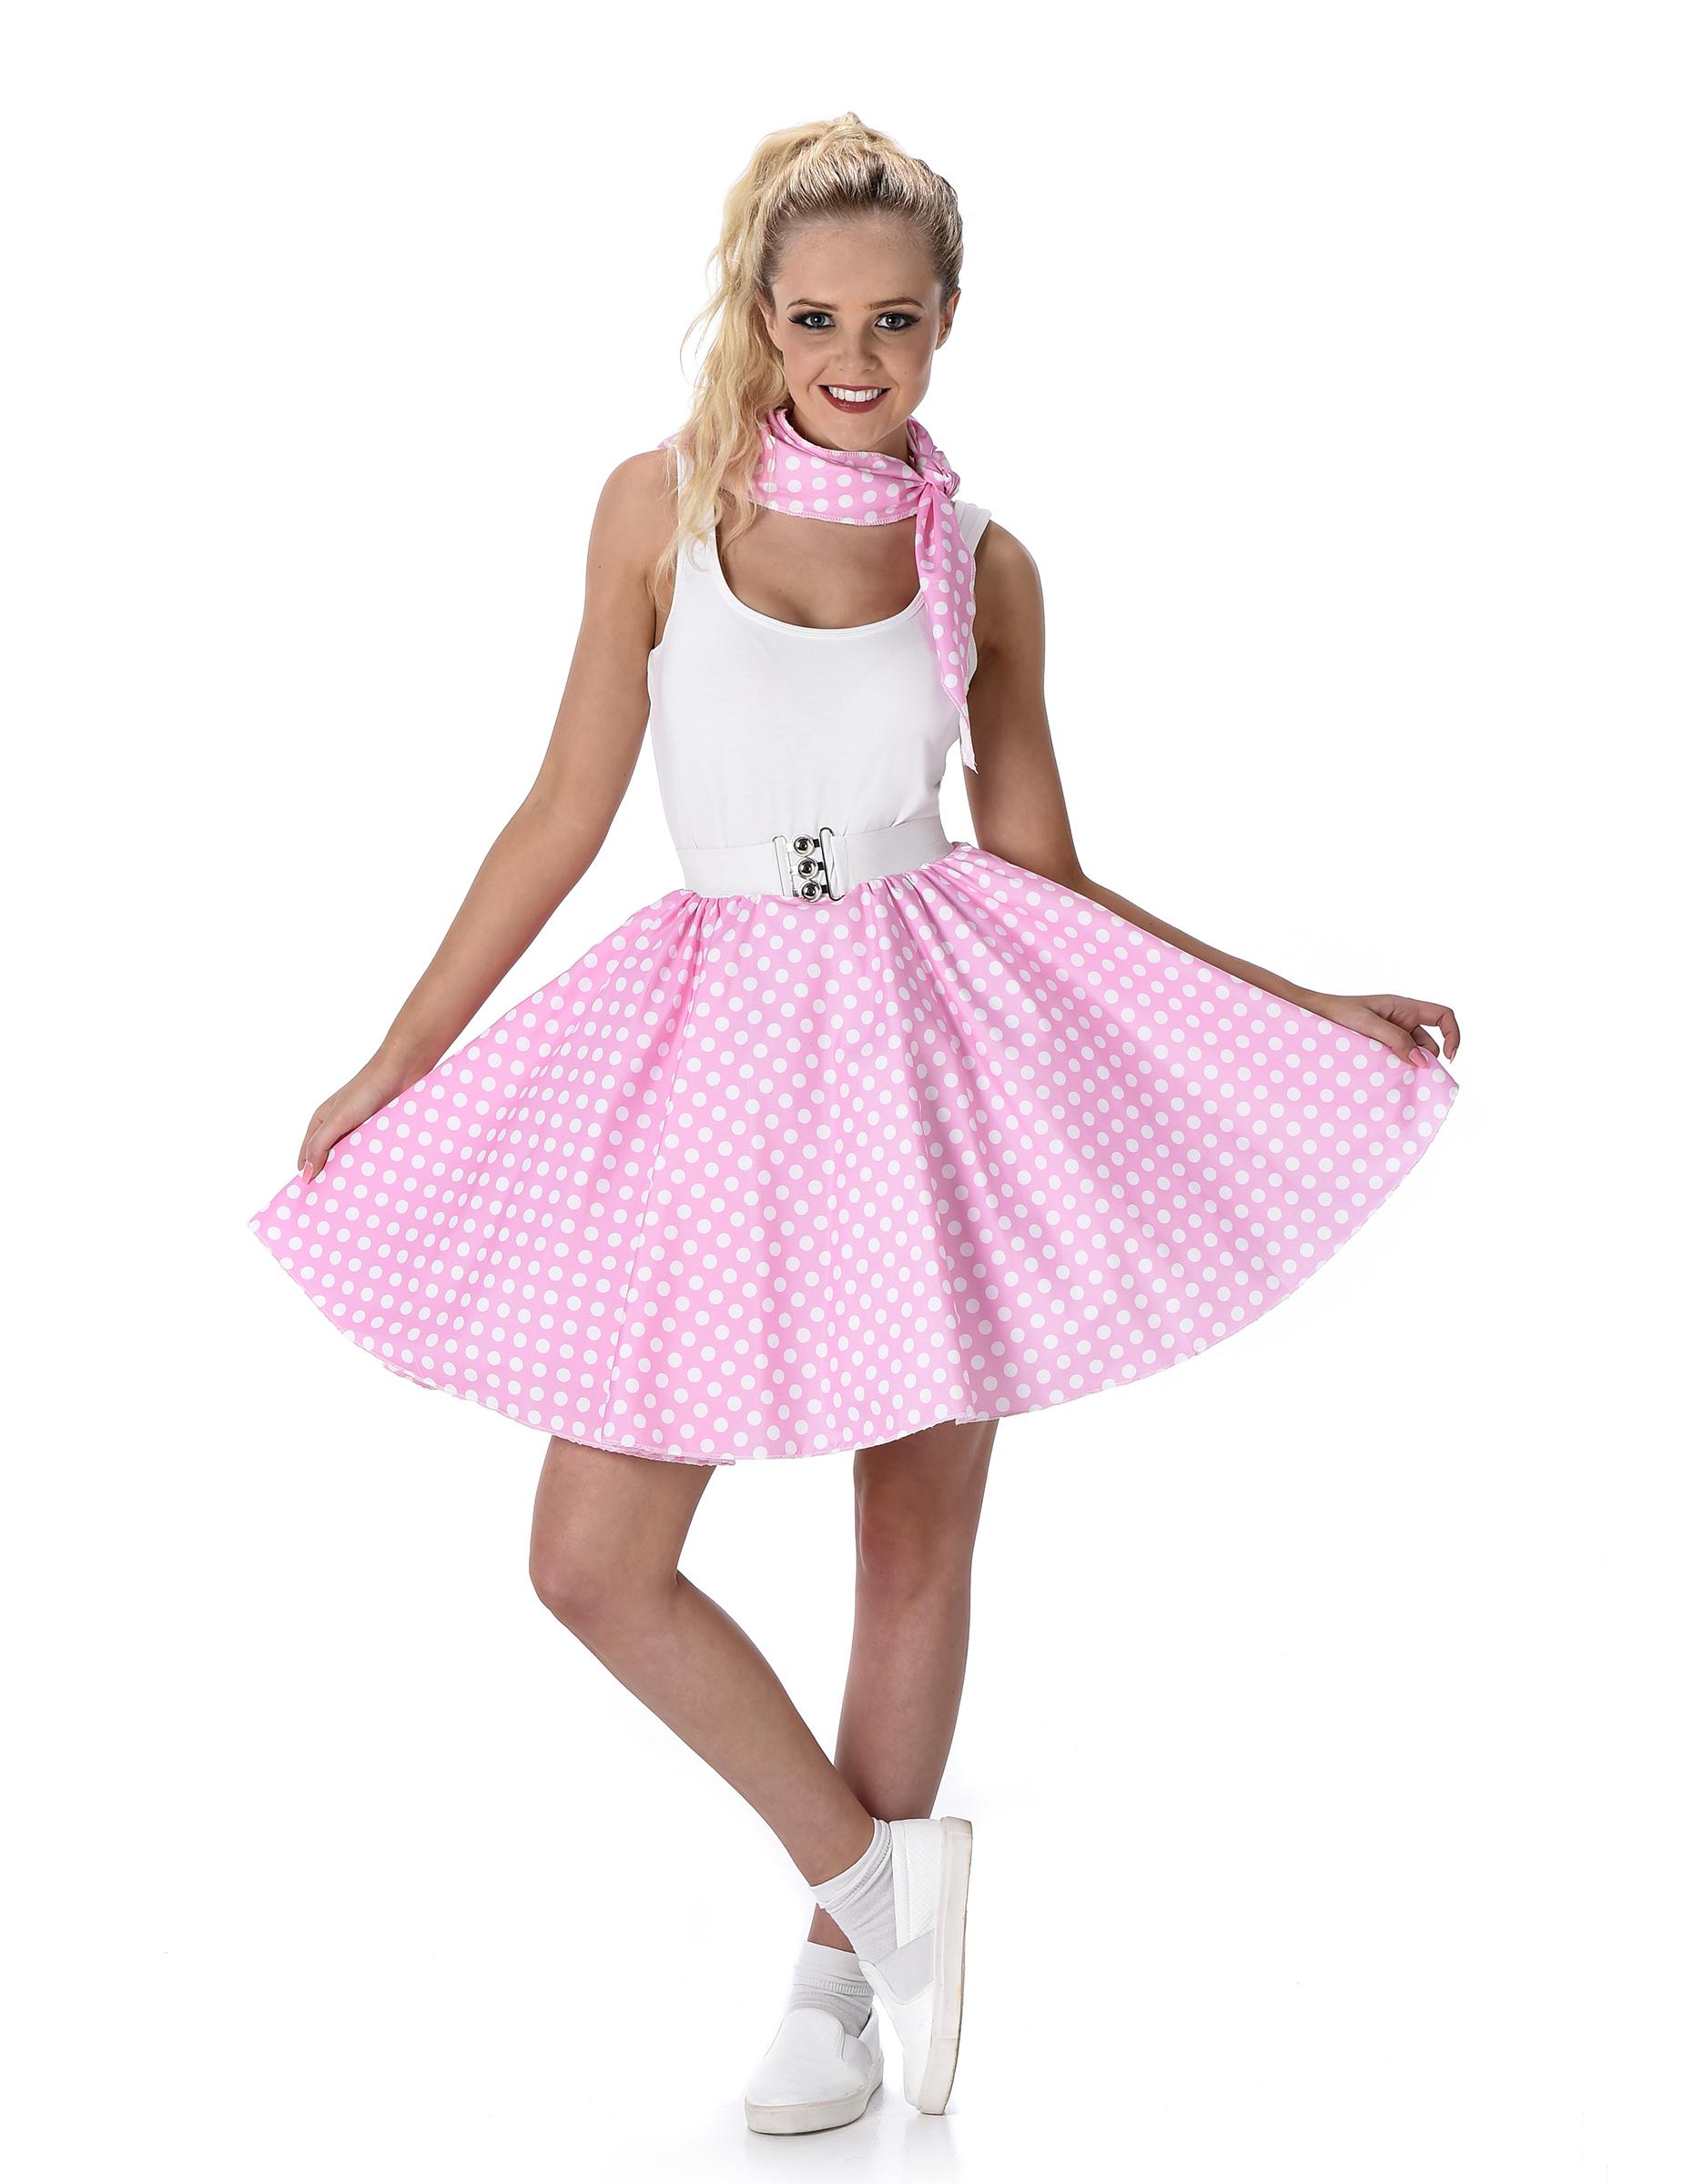 93b8a20ec69f 50er-Jahre Rockabilly Petticoat-Rock mit Halstuch rosa-weiss